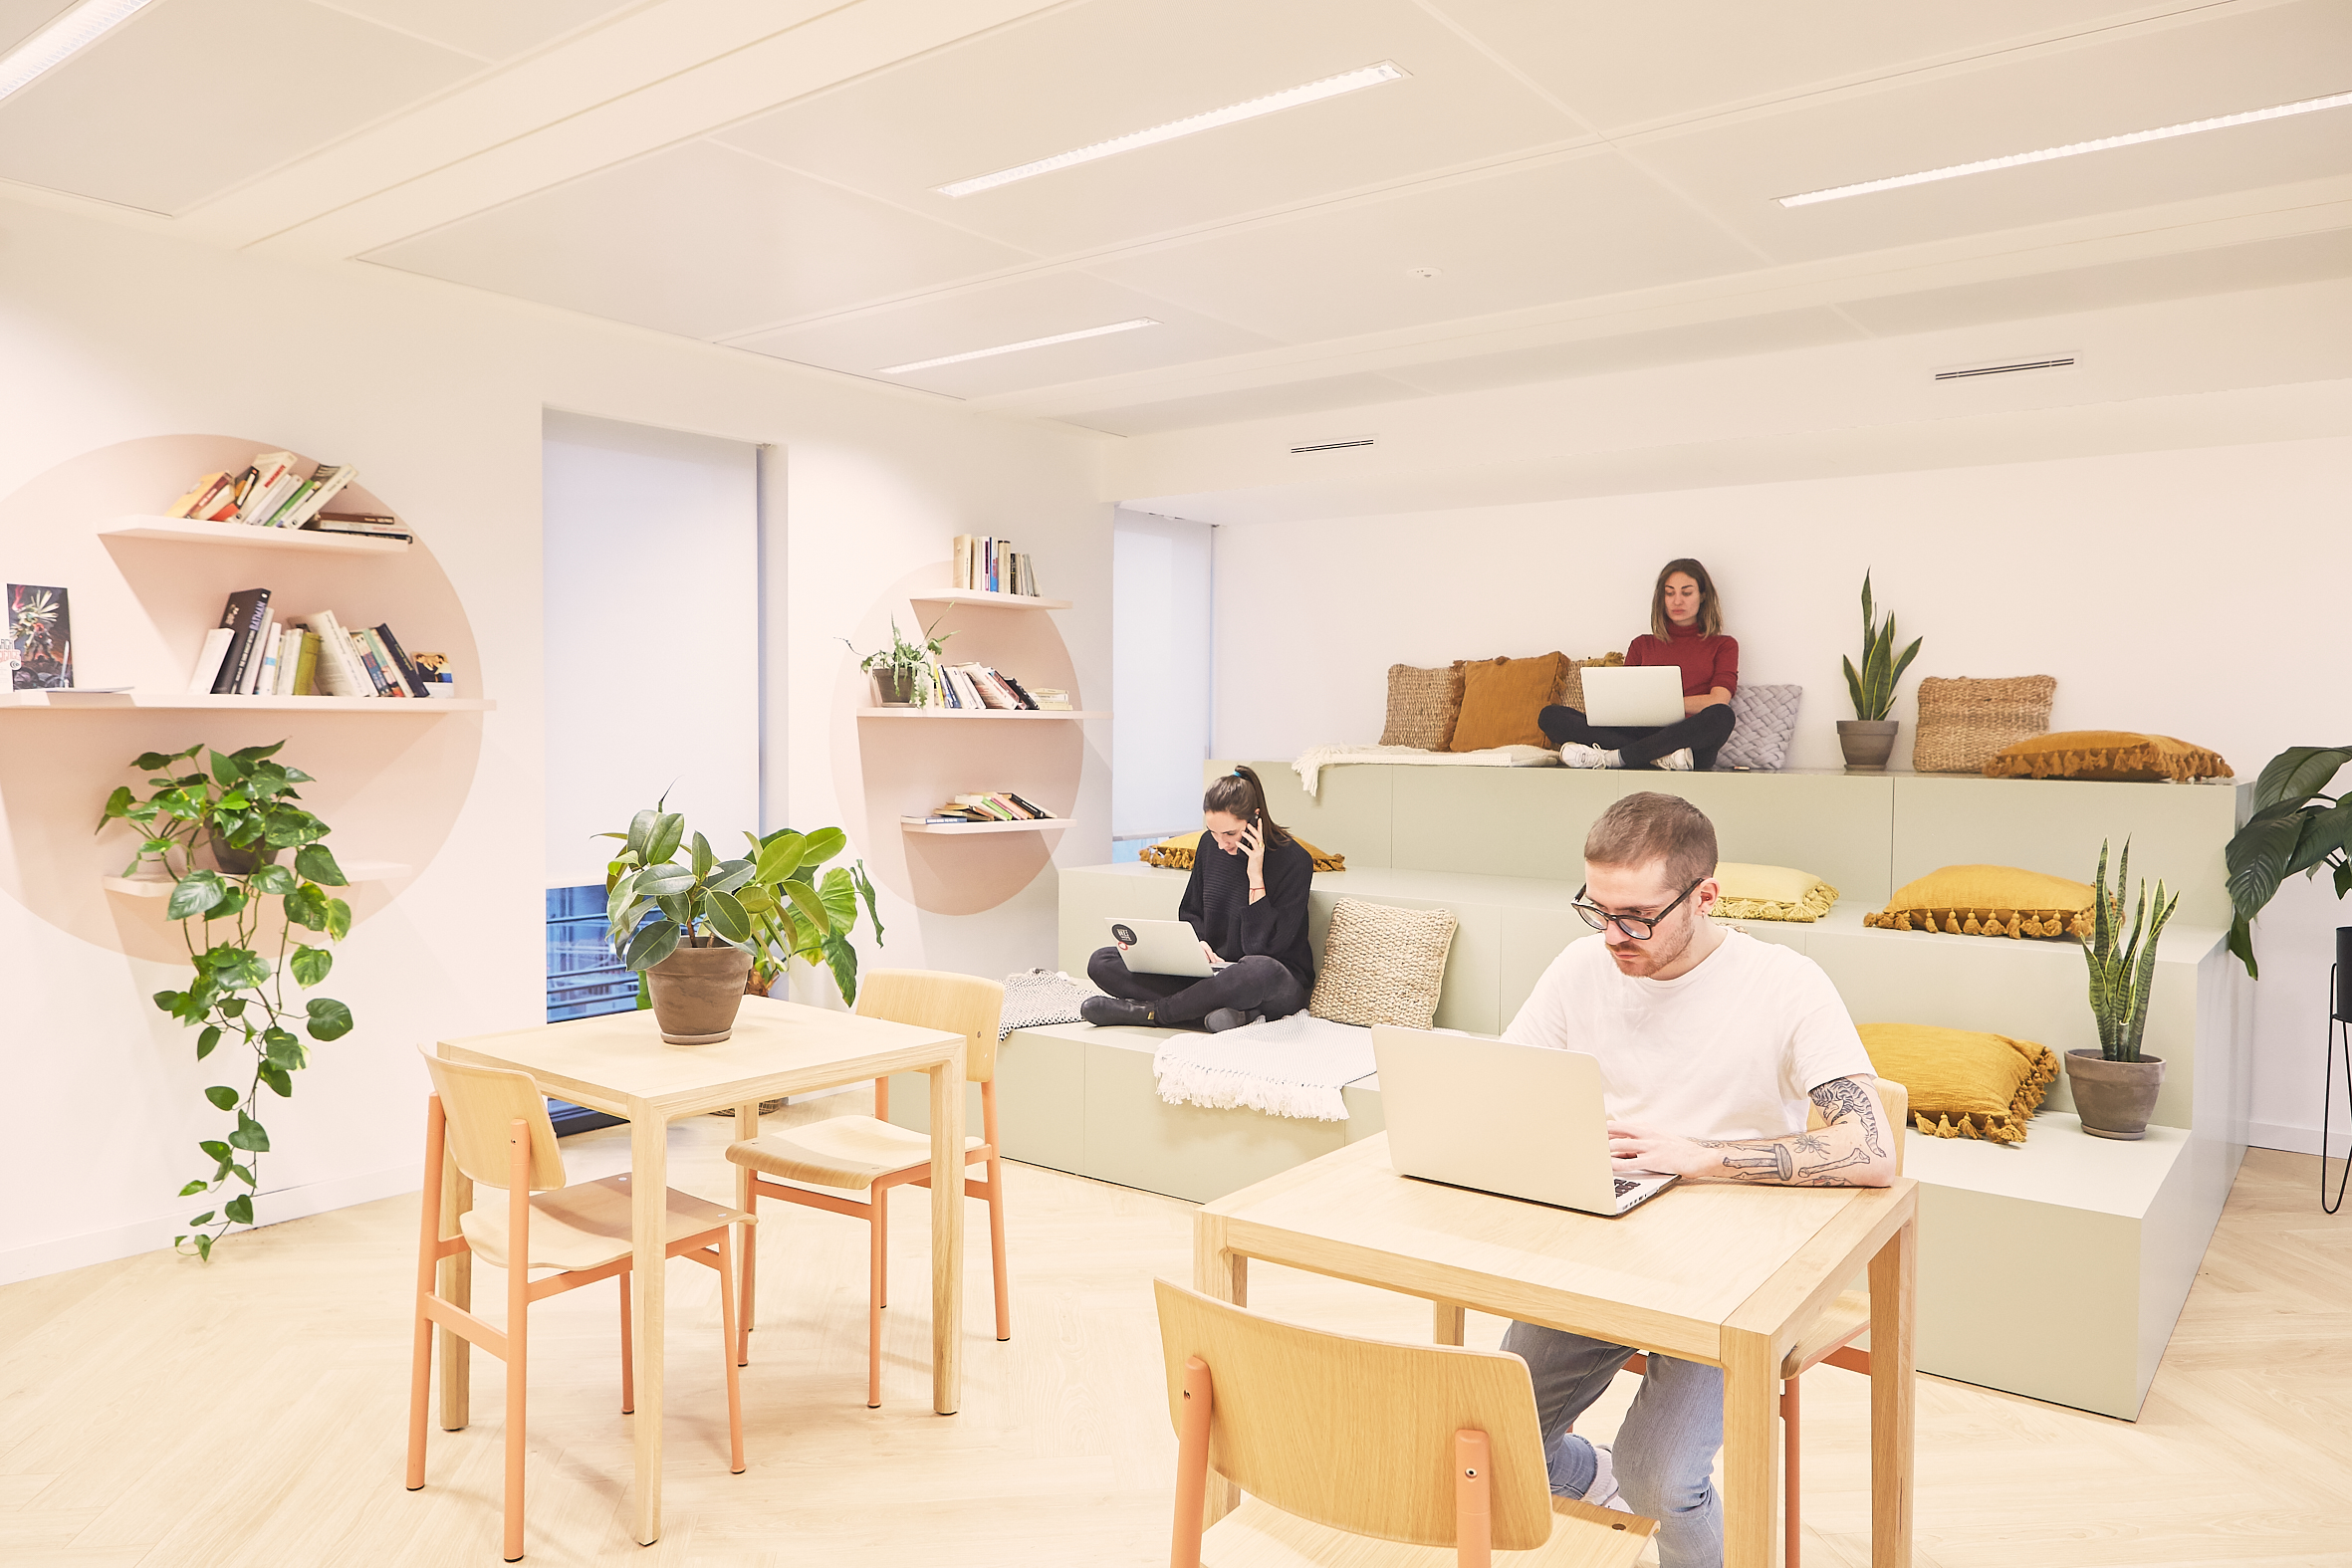 coworking clichy - un open space